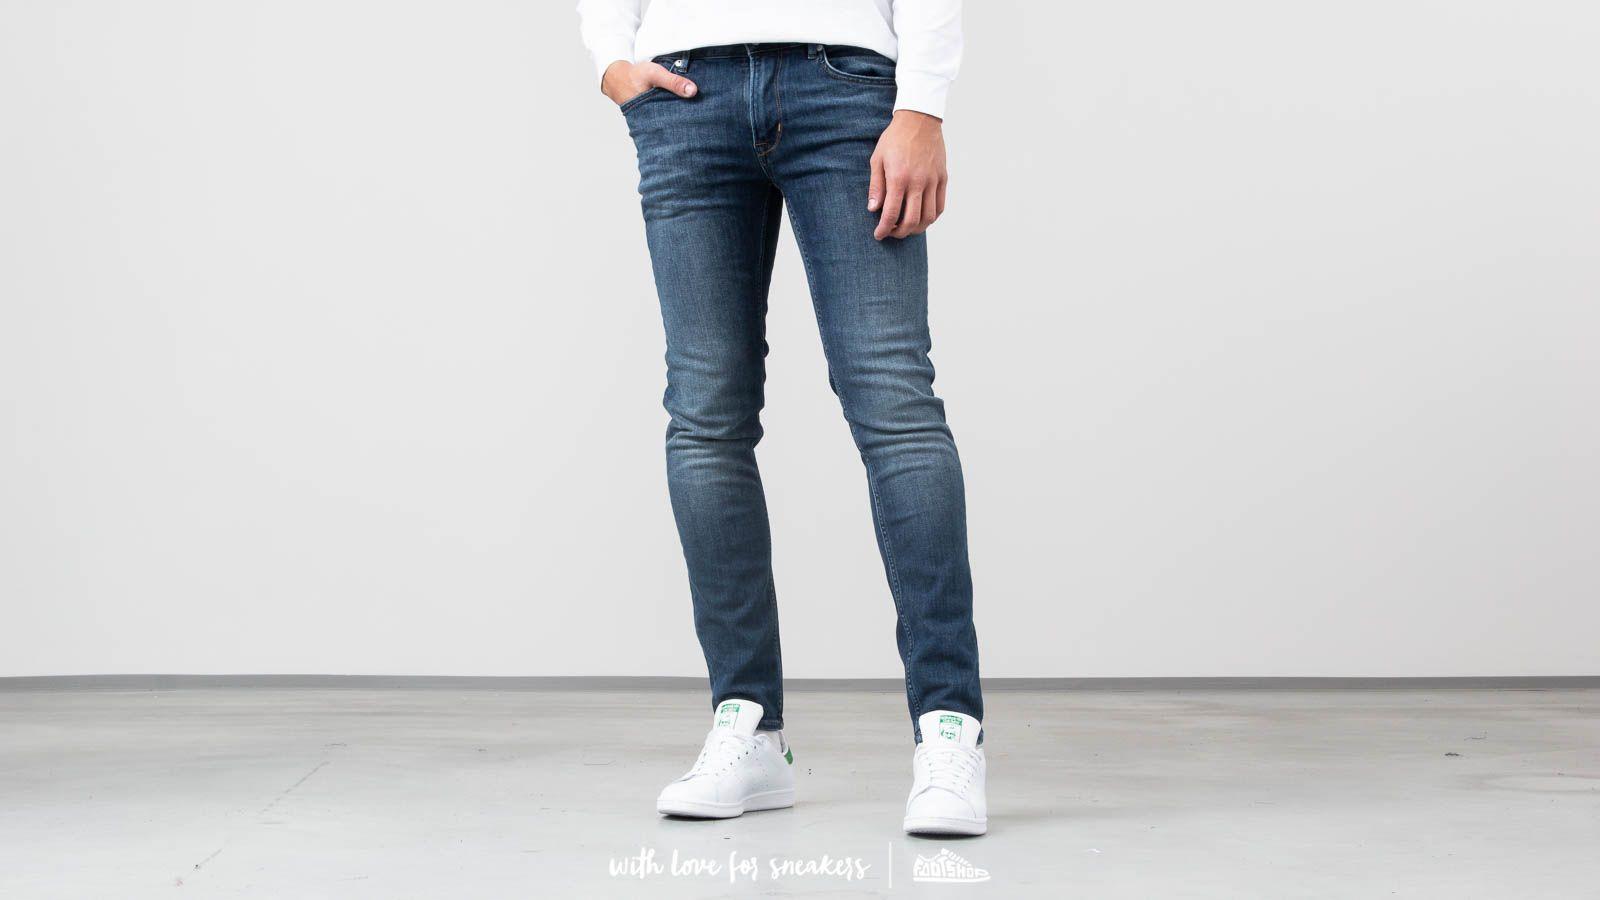 Junk de Luxe Jokas Jeans Mid Wash za skvelú cenu 53 € kúpite na Footshop.sk